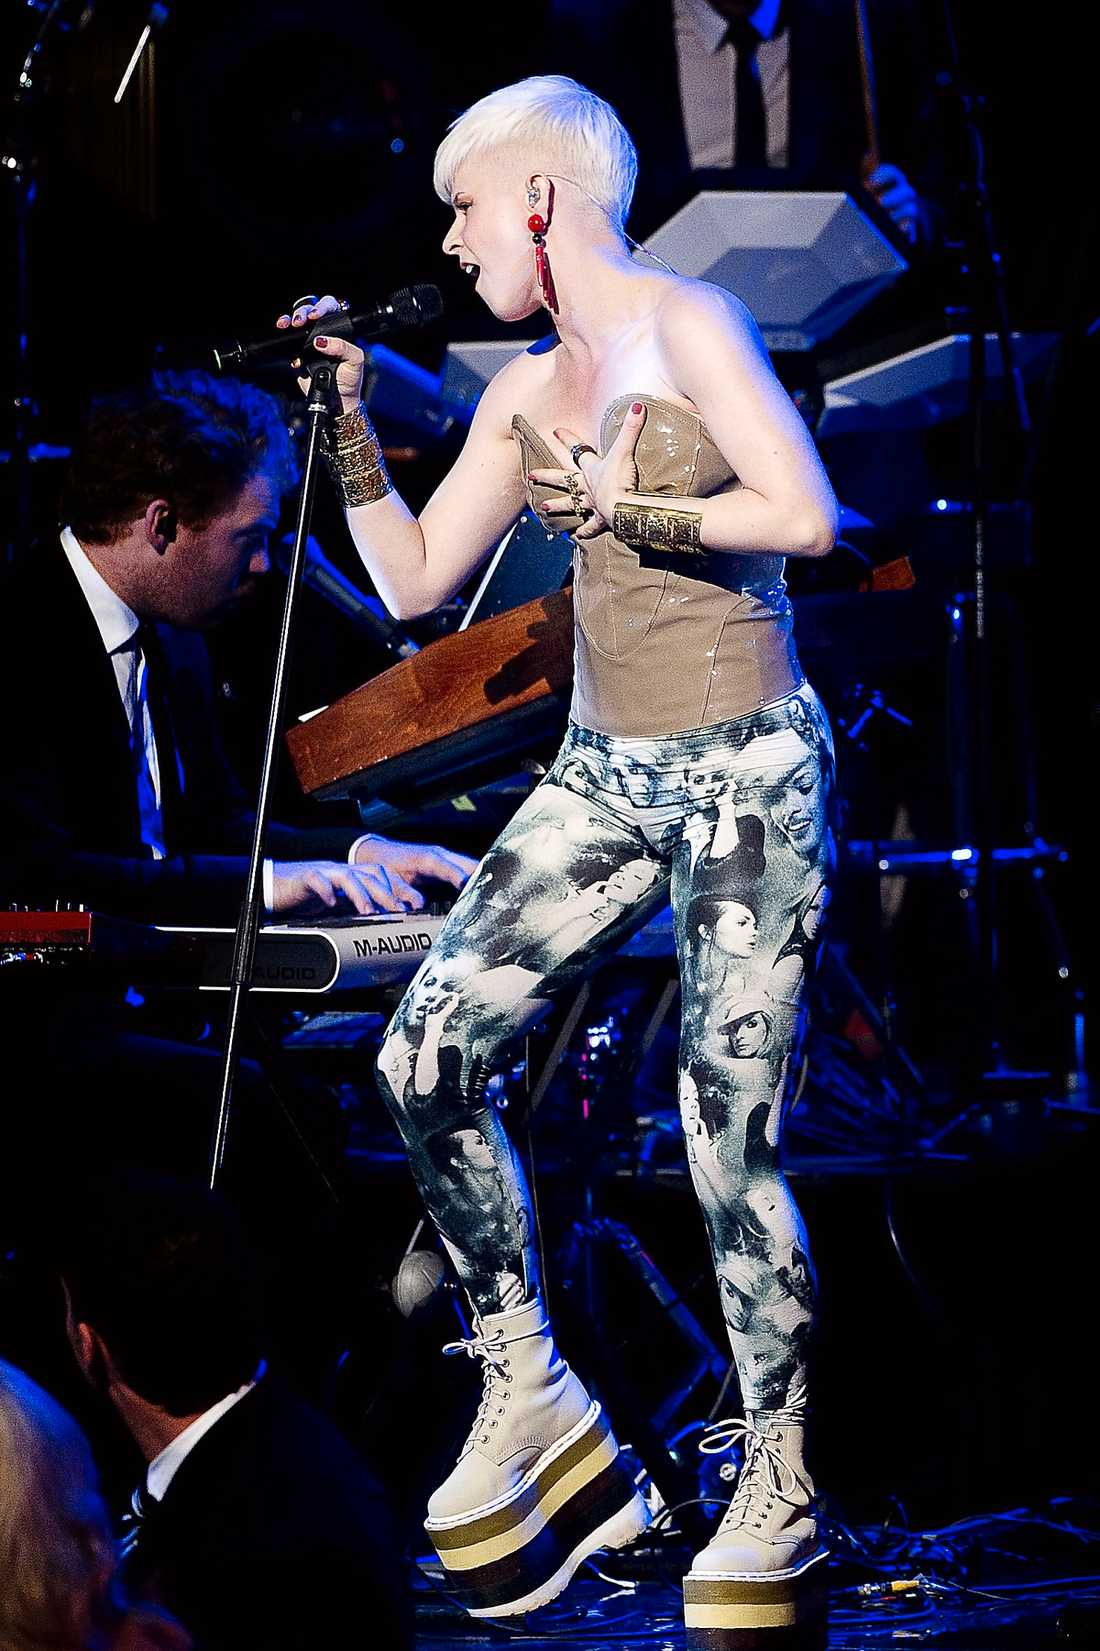 Robyn far omkring imed sina leggings.